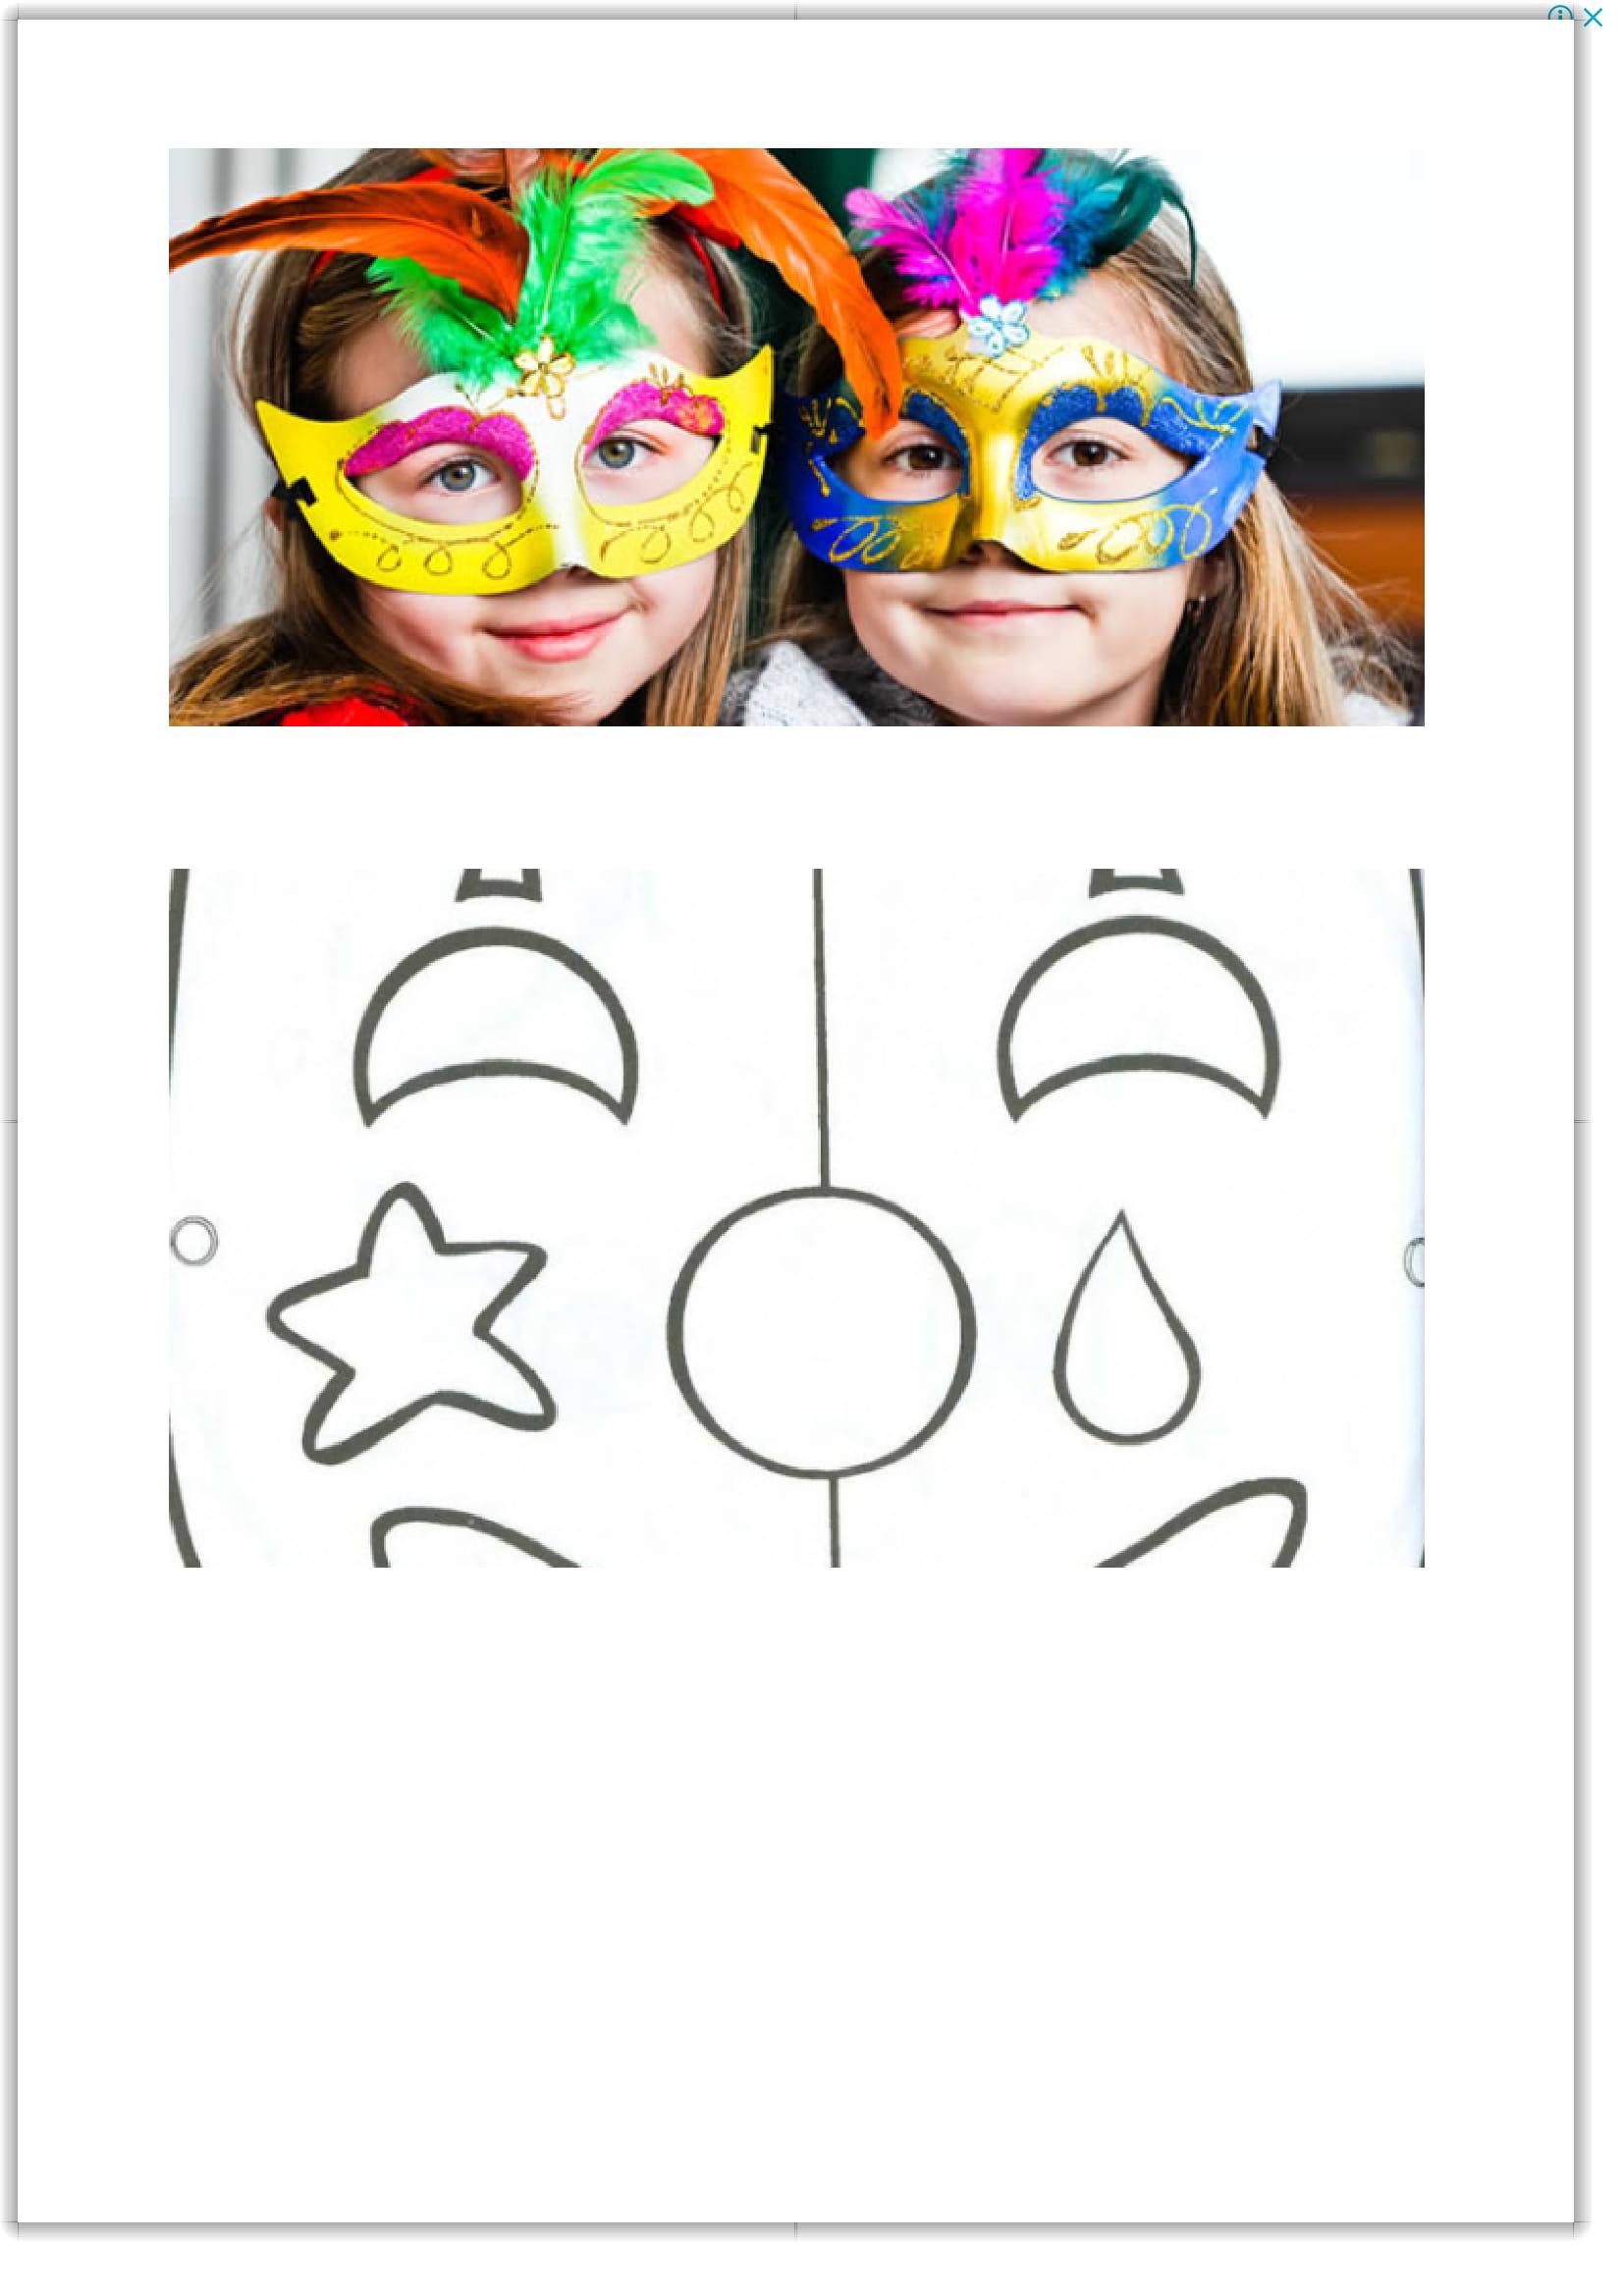 mascaras-de-carnaval-para-baixar-gratis-2